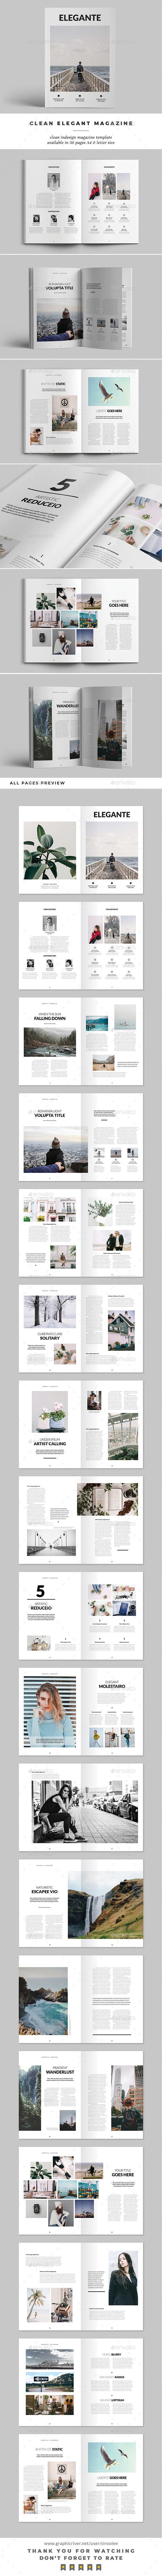 Clean Elegant Magazine - Magazines Print Templates